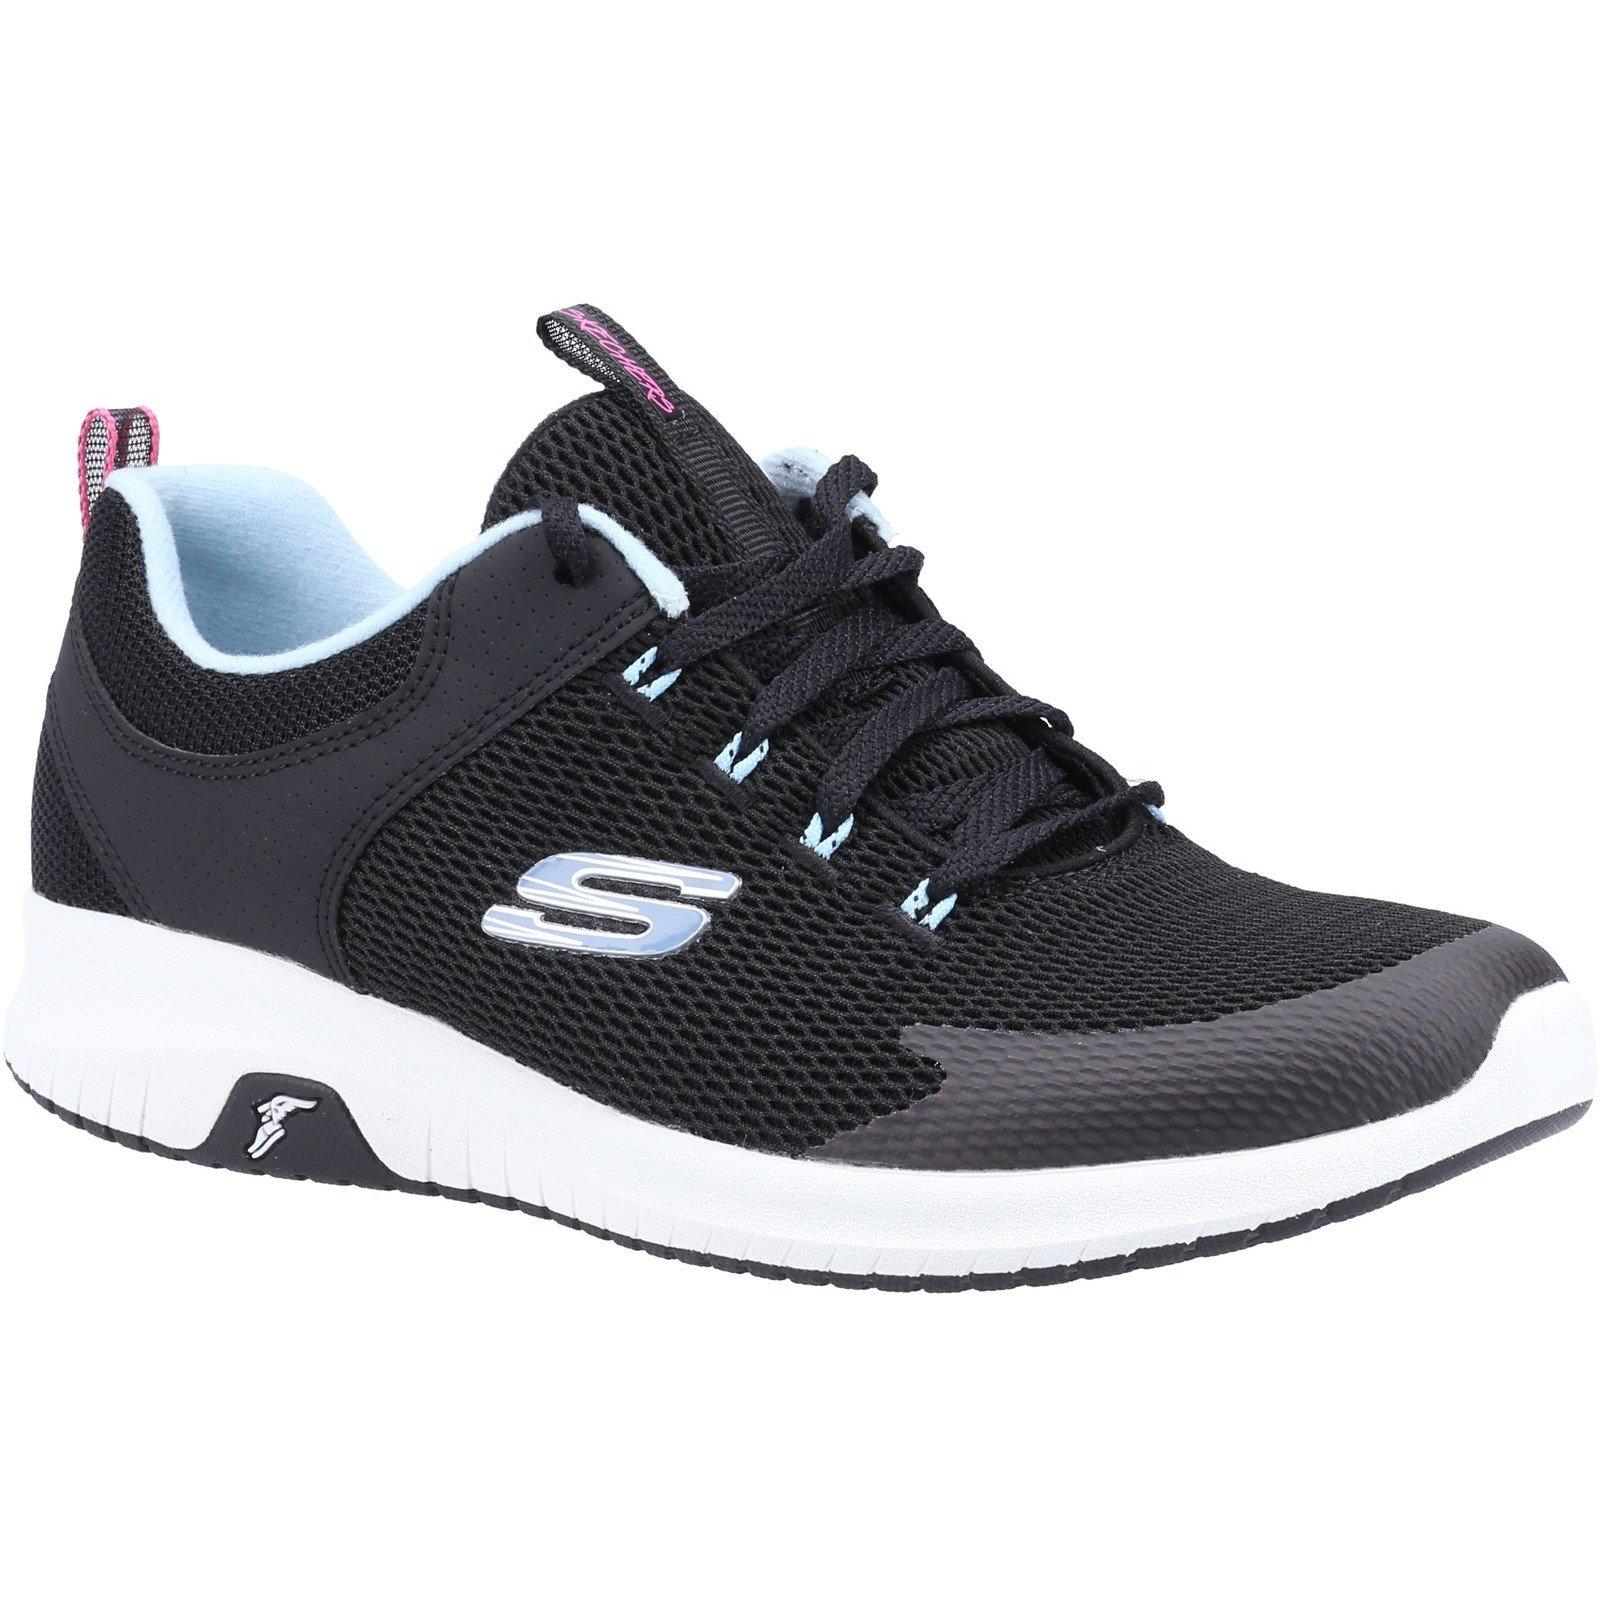 Skechers Women's Ultra Flex Prime Step Out Trainer Multicolor 32112 - Black/Light Blue 7